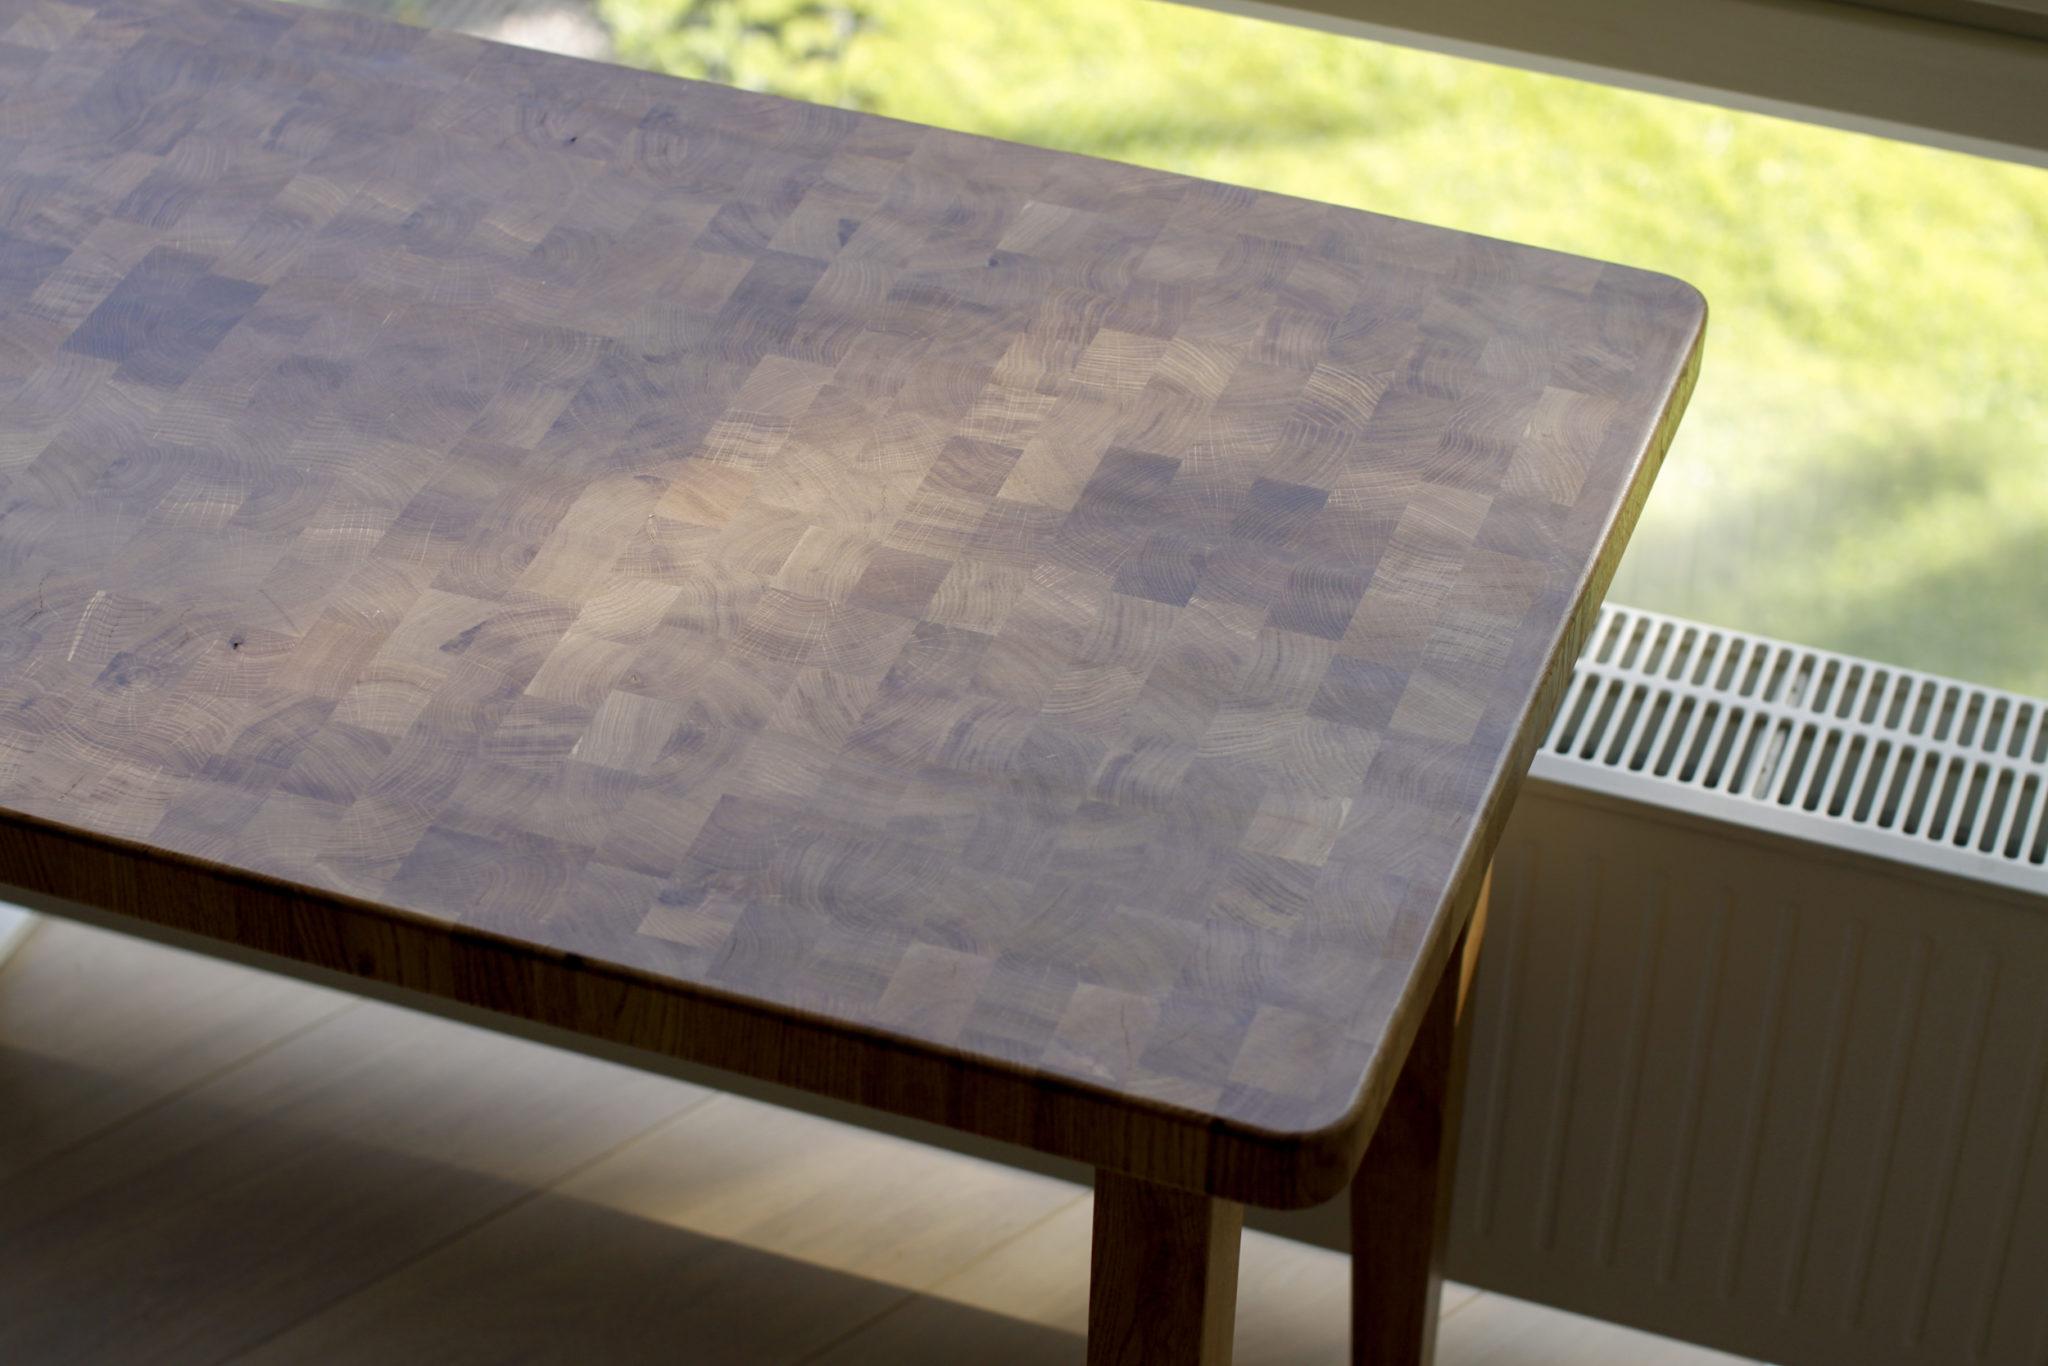 End-grain table top